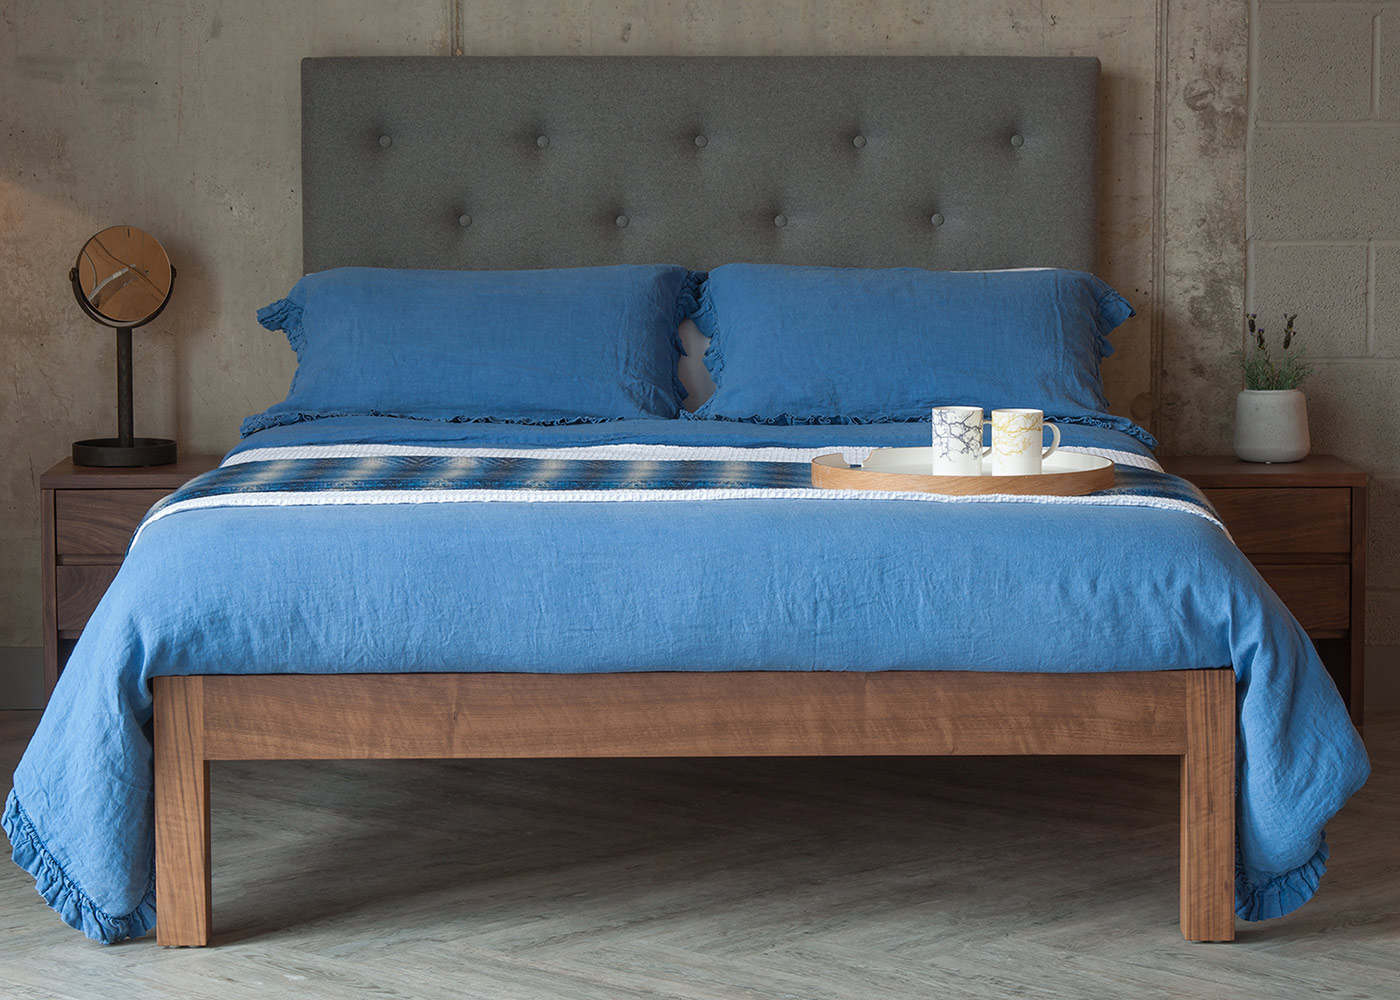 skye-bed-inspiration